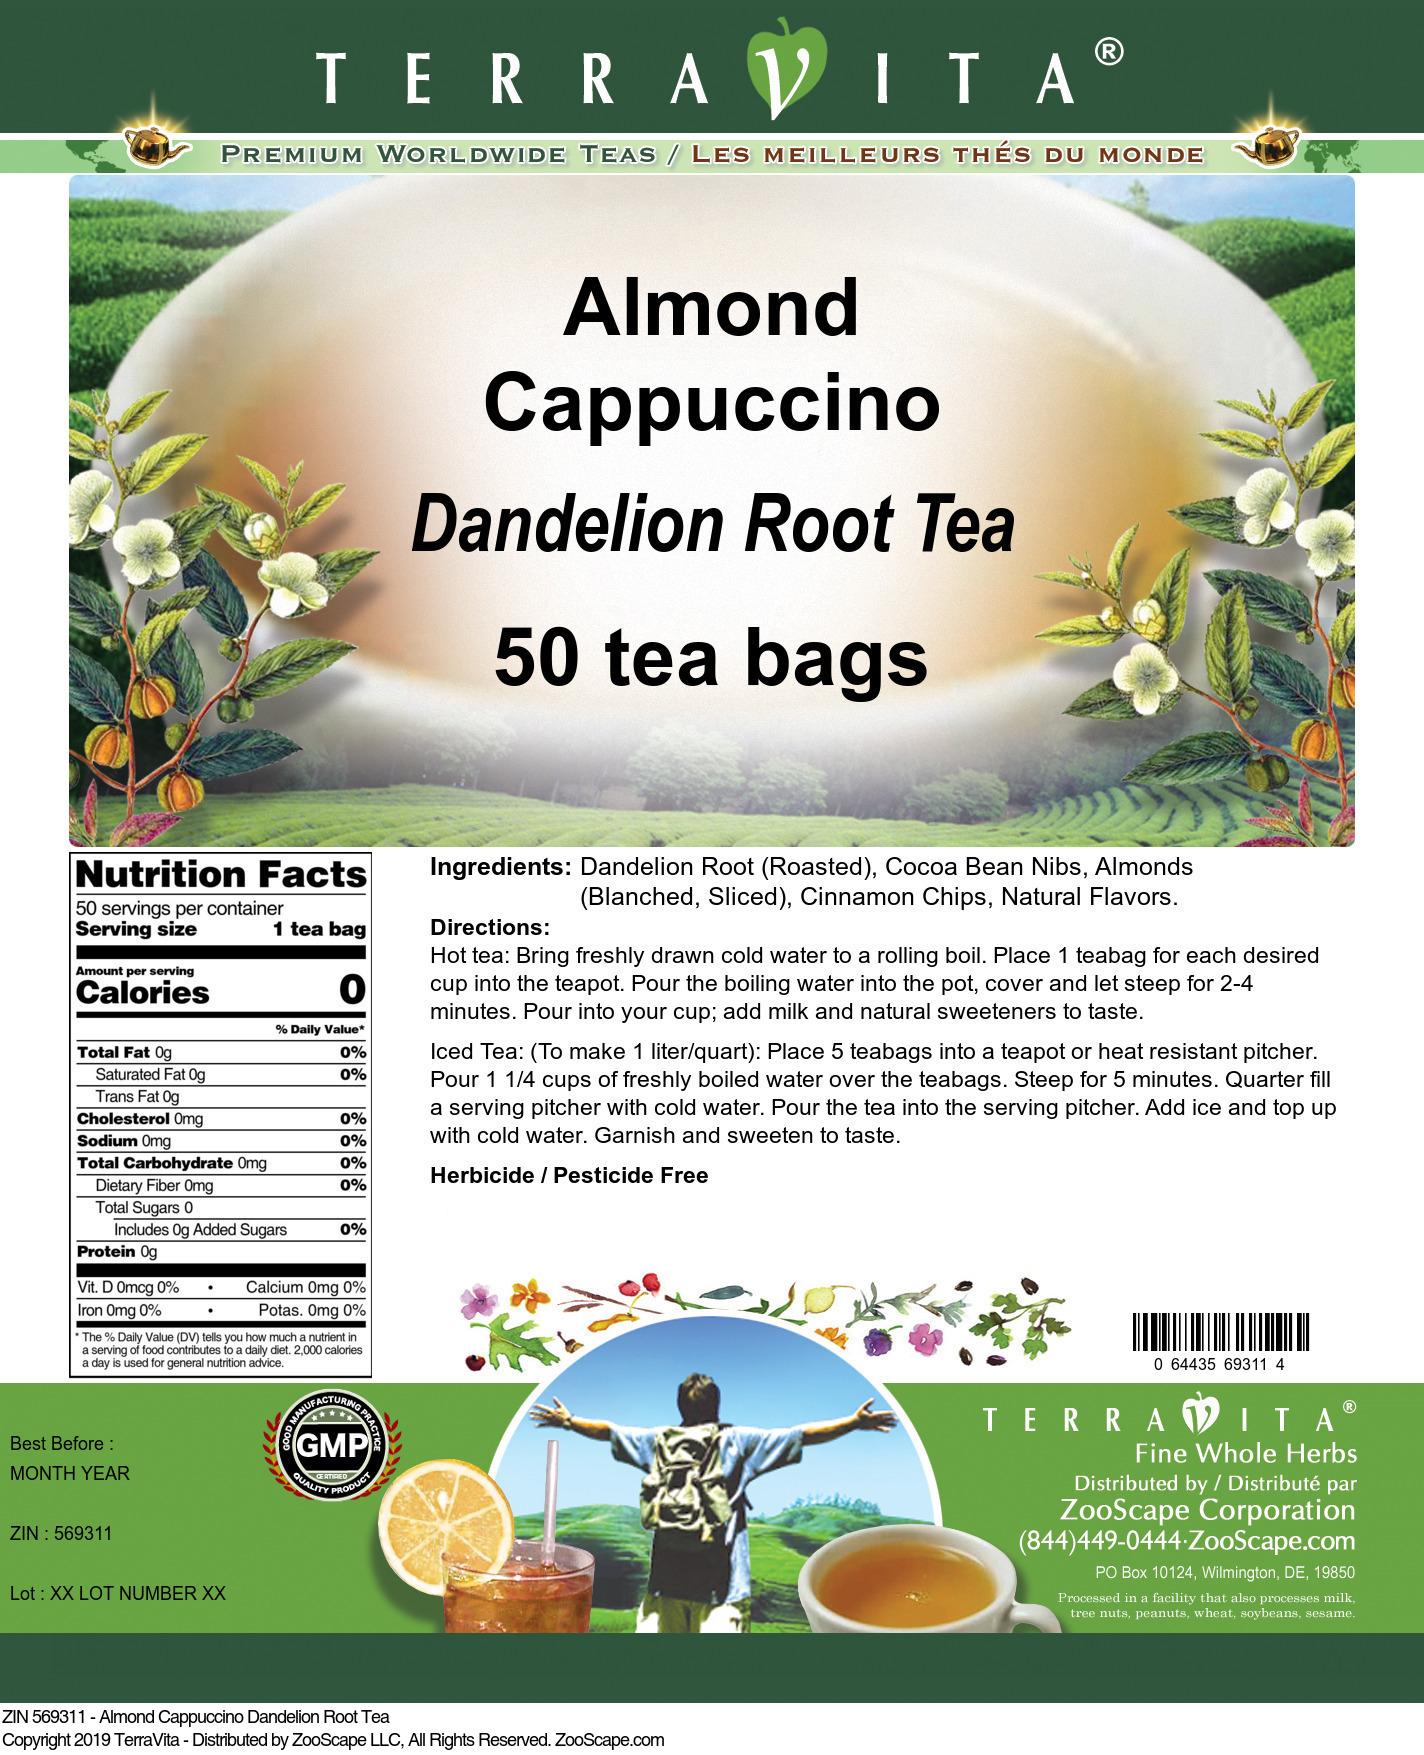 Almond Cappuccino Dandelion Root